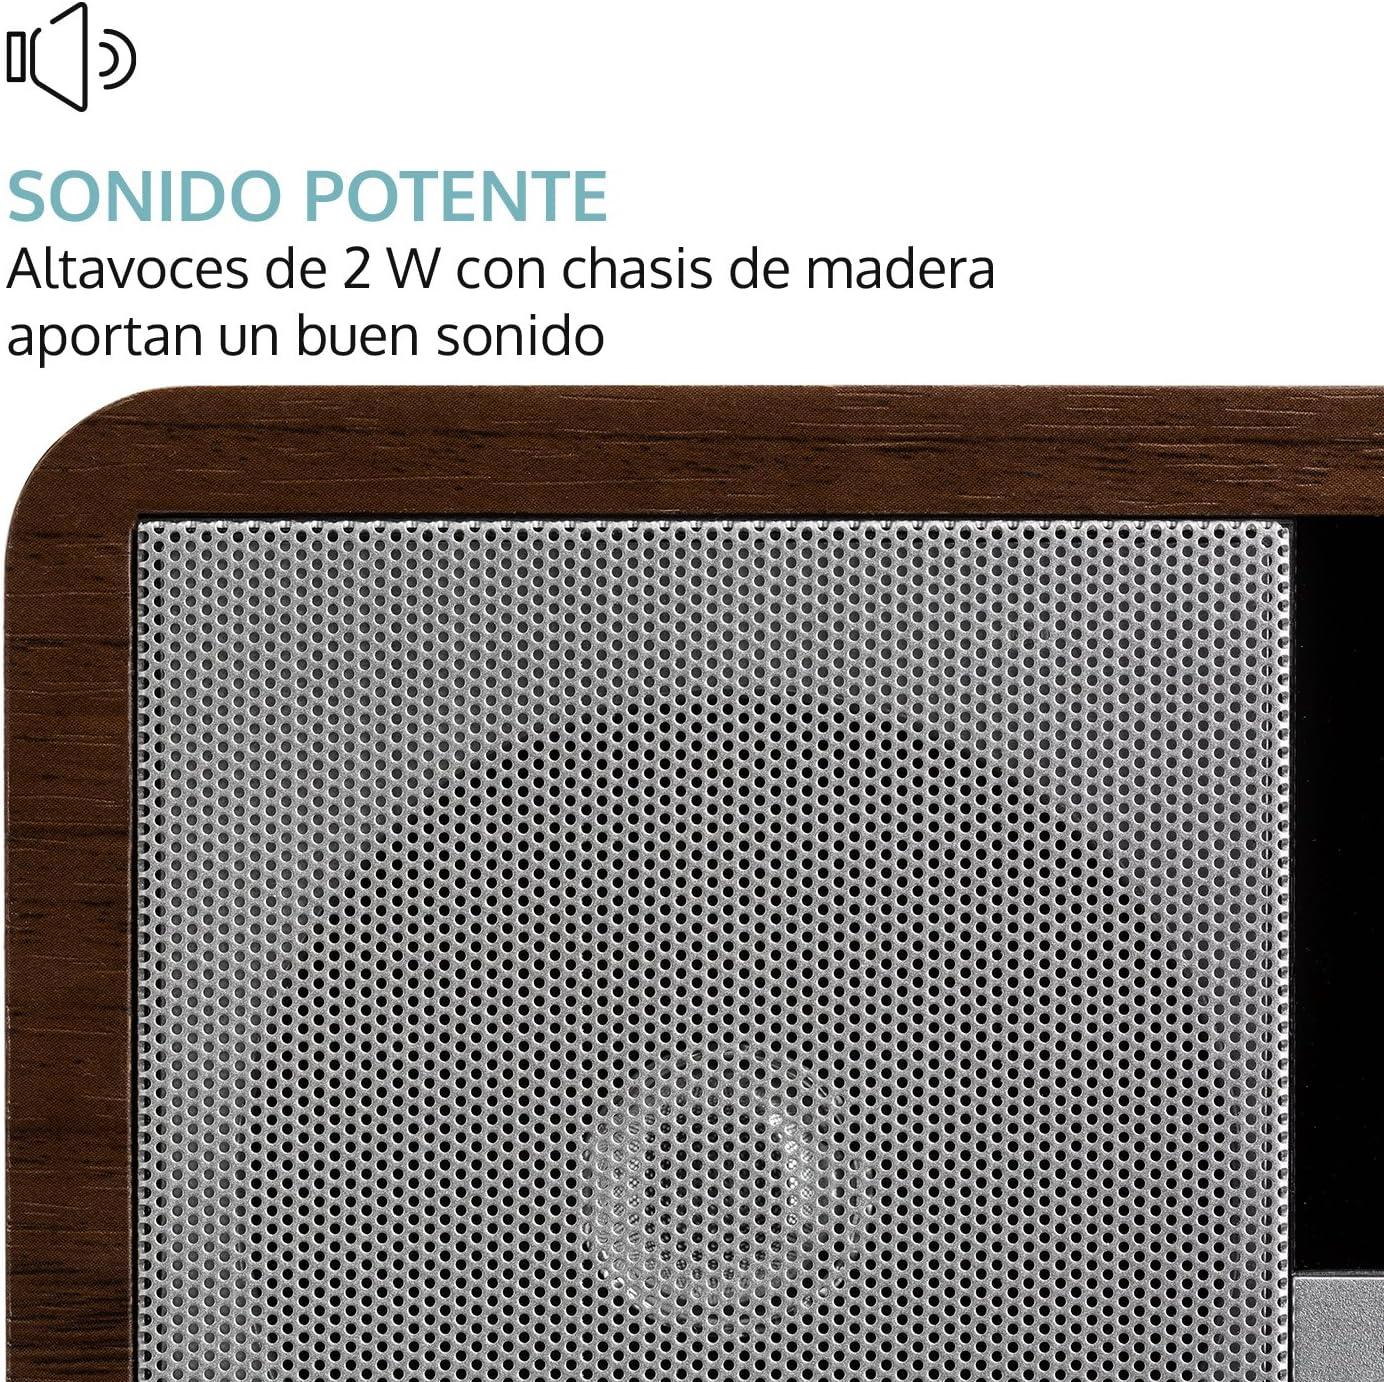 RDS AUX Alarma Dual Reproduce MP3 Temporizador auna Worldwide Mini WMA Blanco Floral FM Altavoz Mono 2 vatios Wi-Fi Dab+ Radio Internet Pantalla LCD Dab Puerto USB